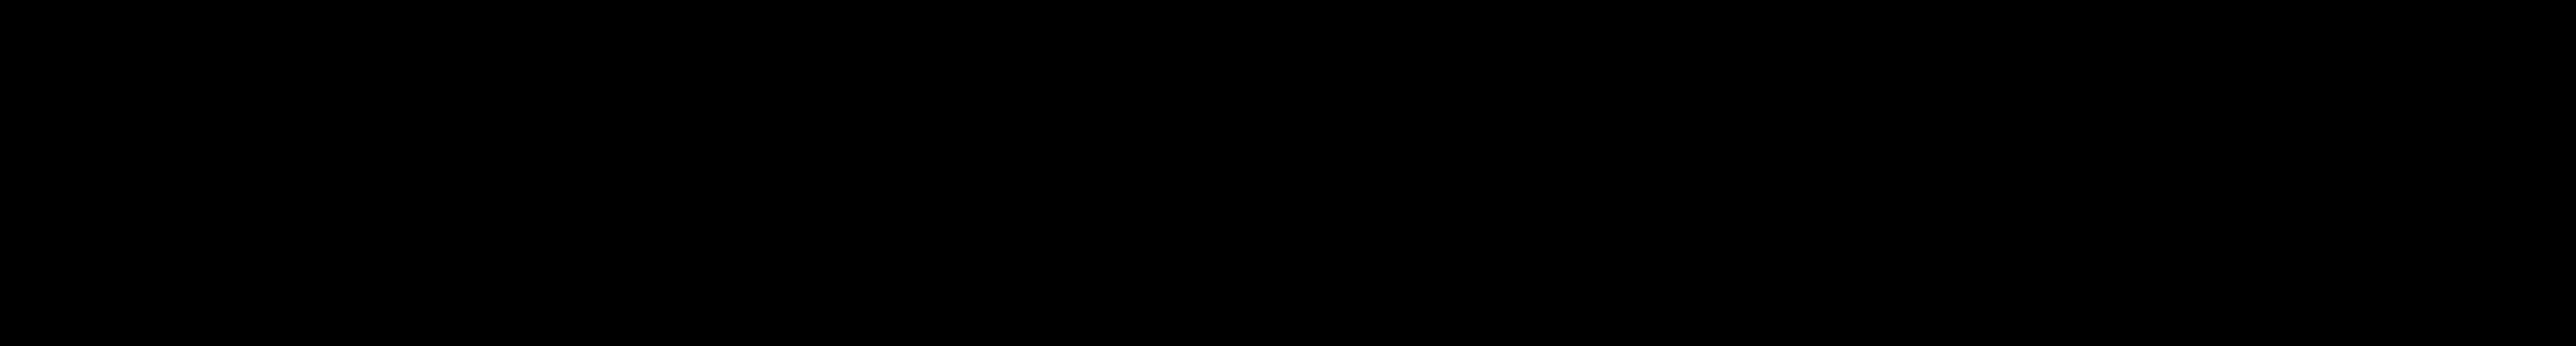 drantwala.com